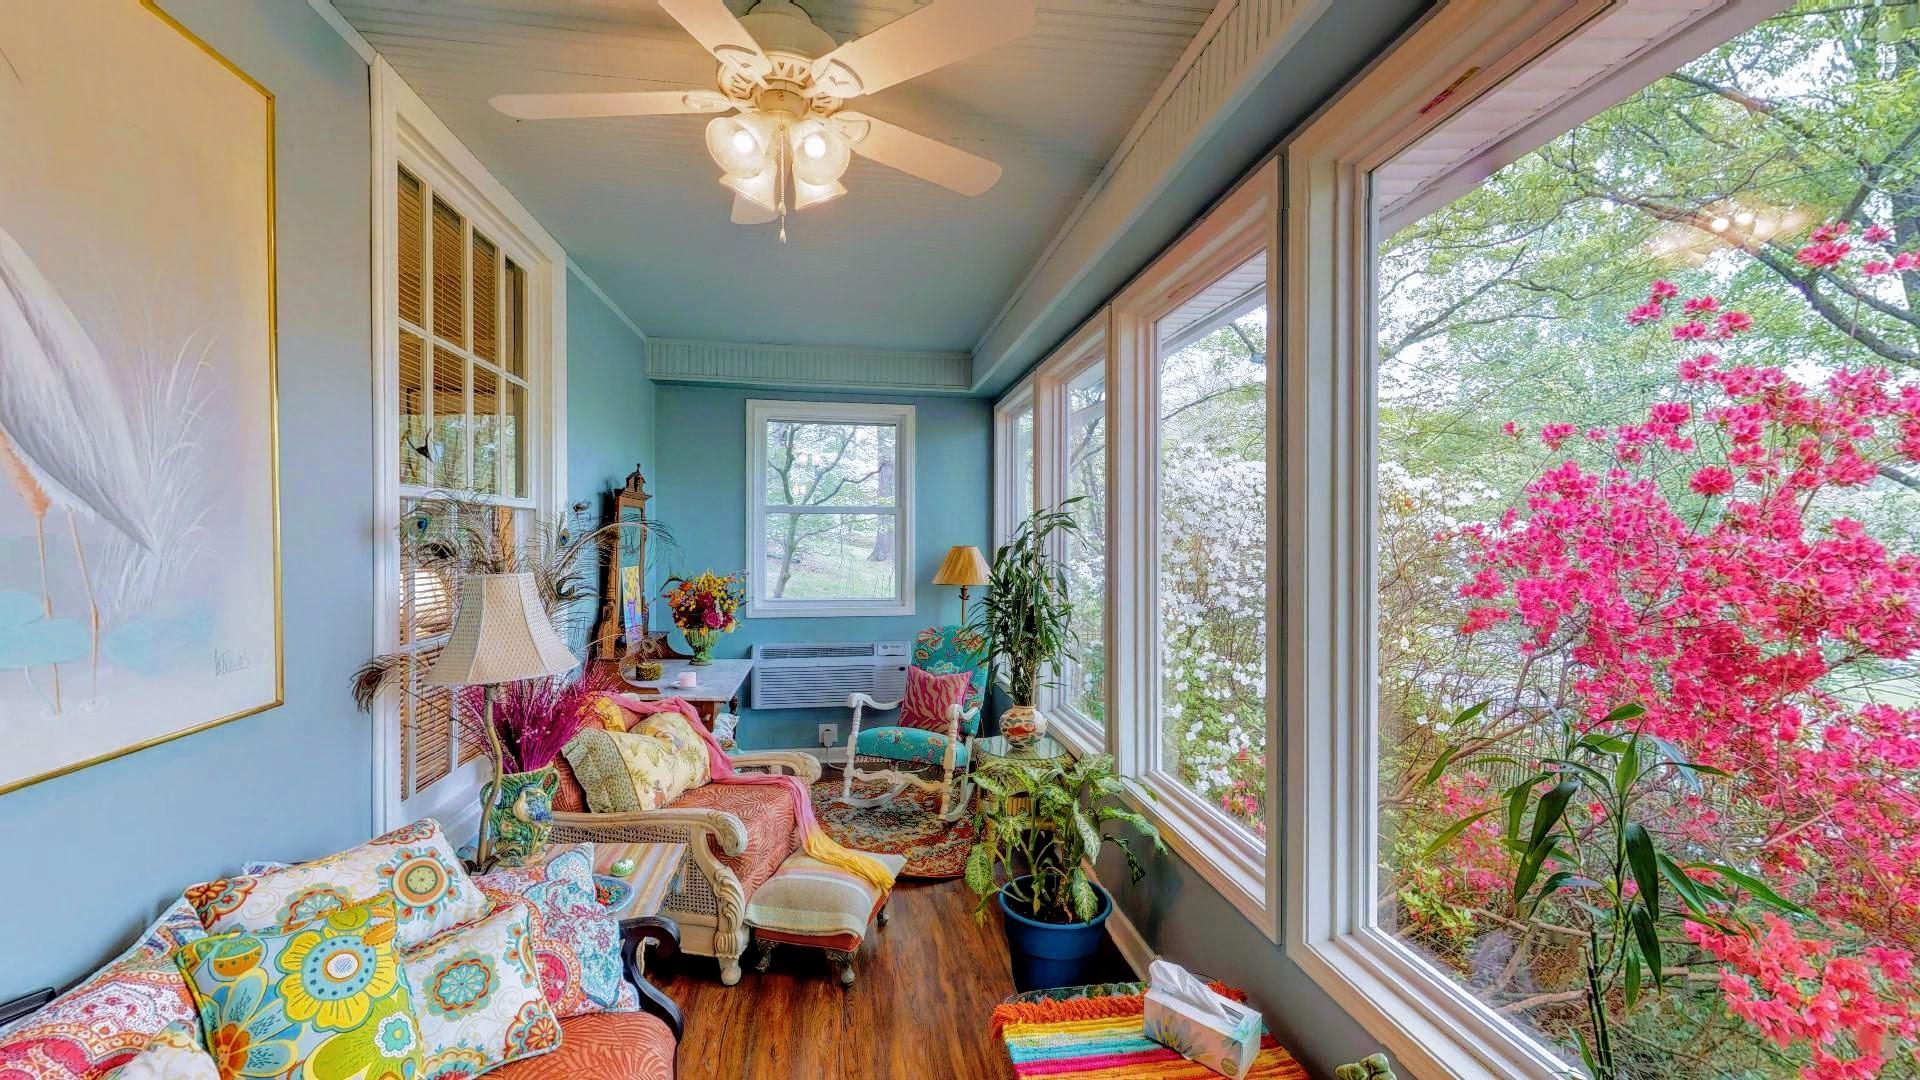 201 Grove Blvd, Paris, TN 38242 - Paris, TN real estate listing